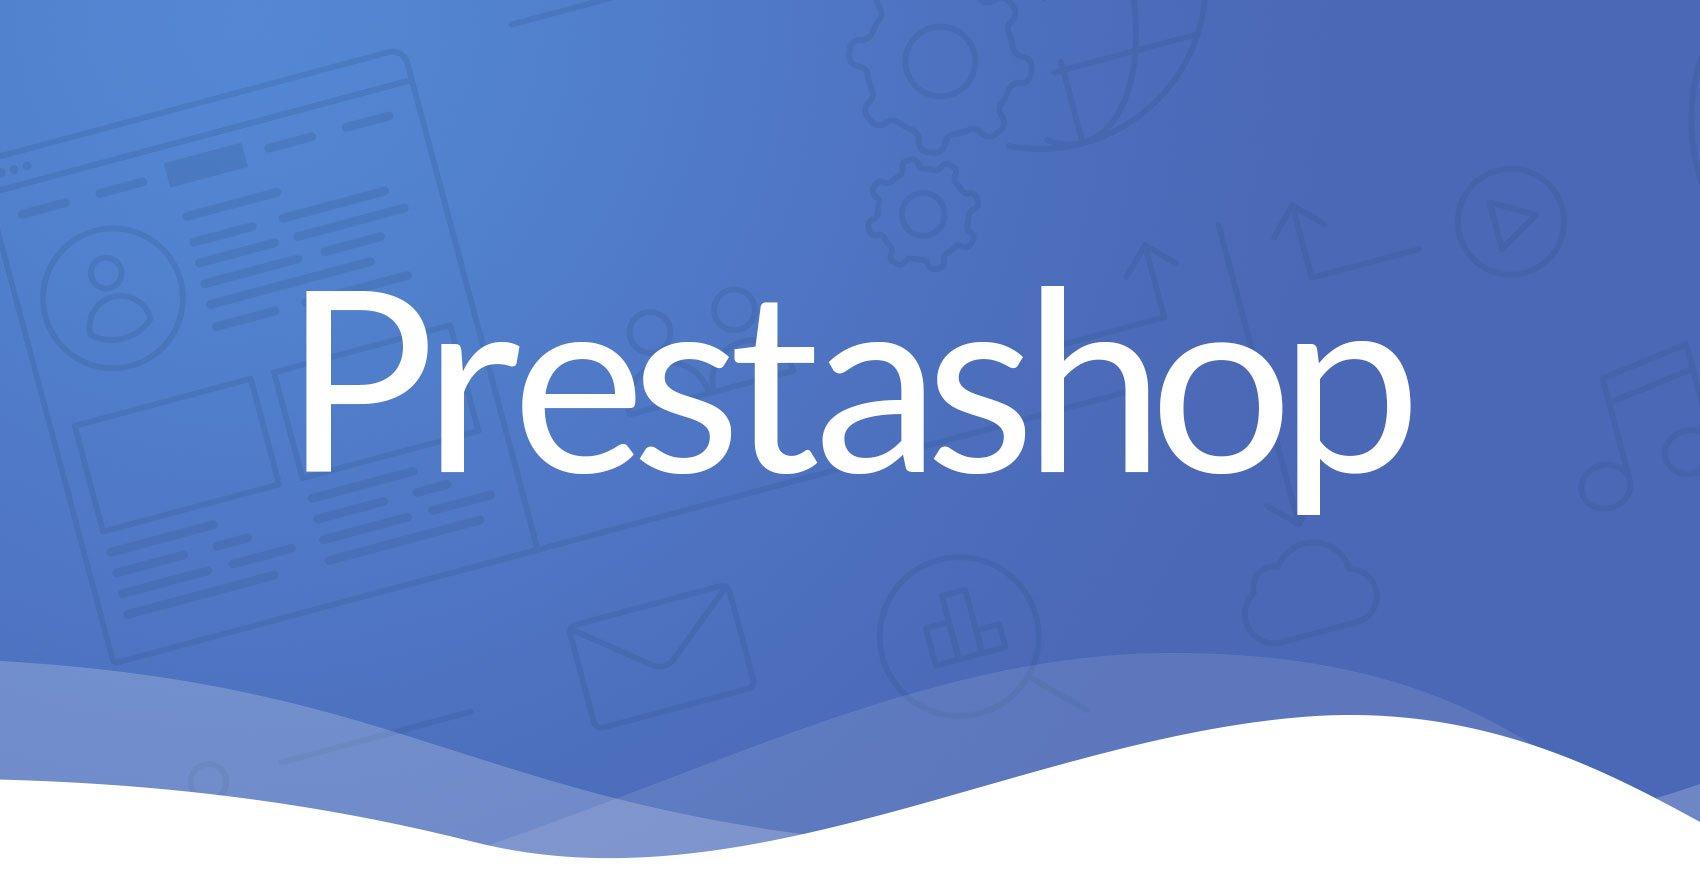 Kompilacja szablonu Default Bootstrap w Prestashop 1.5-1.6